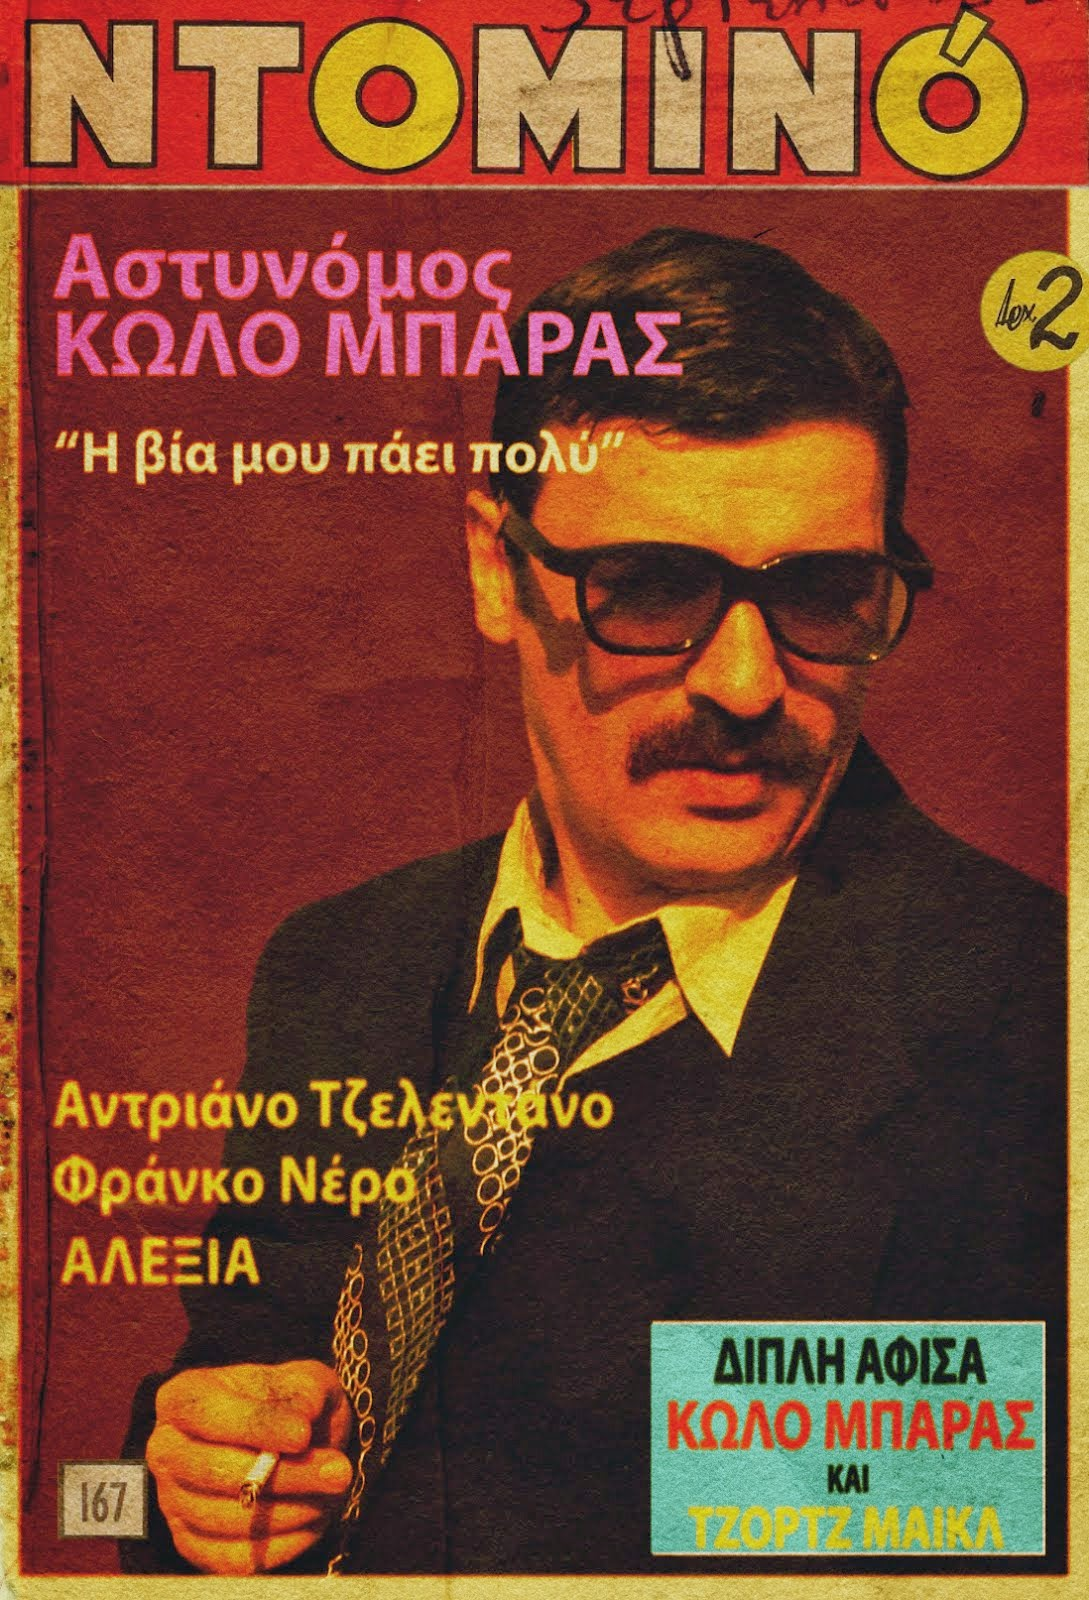 DOMINO 80's magazine